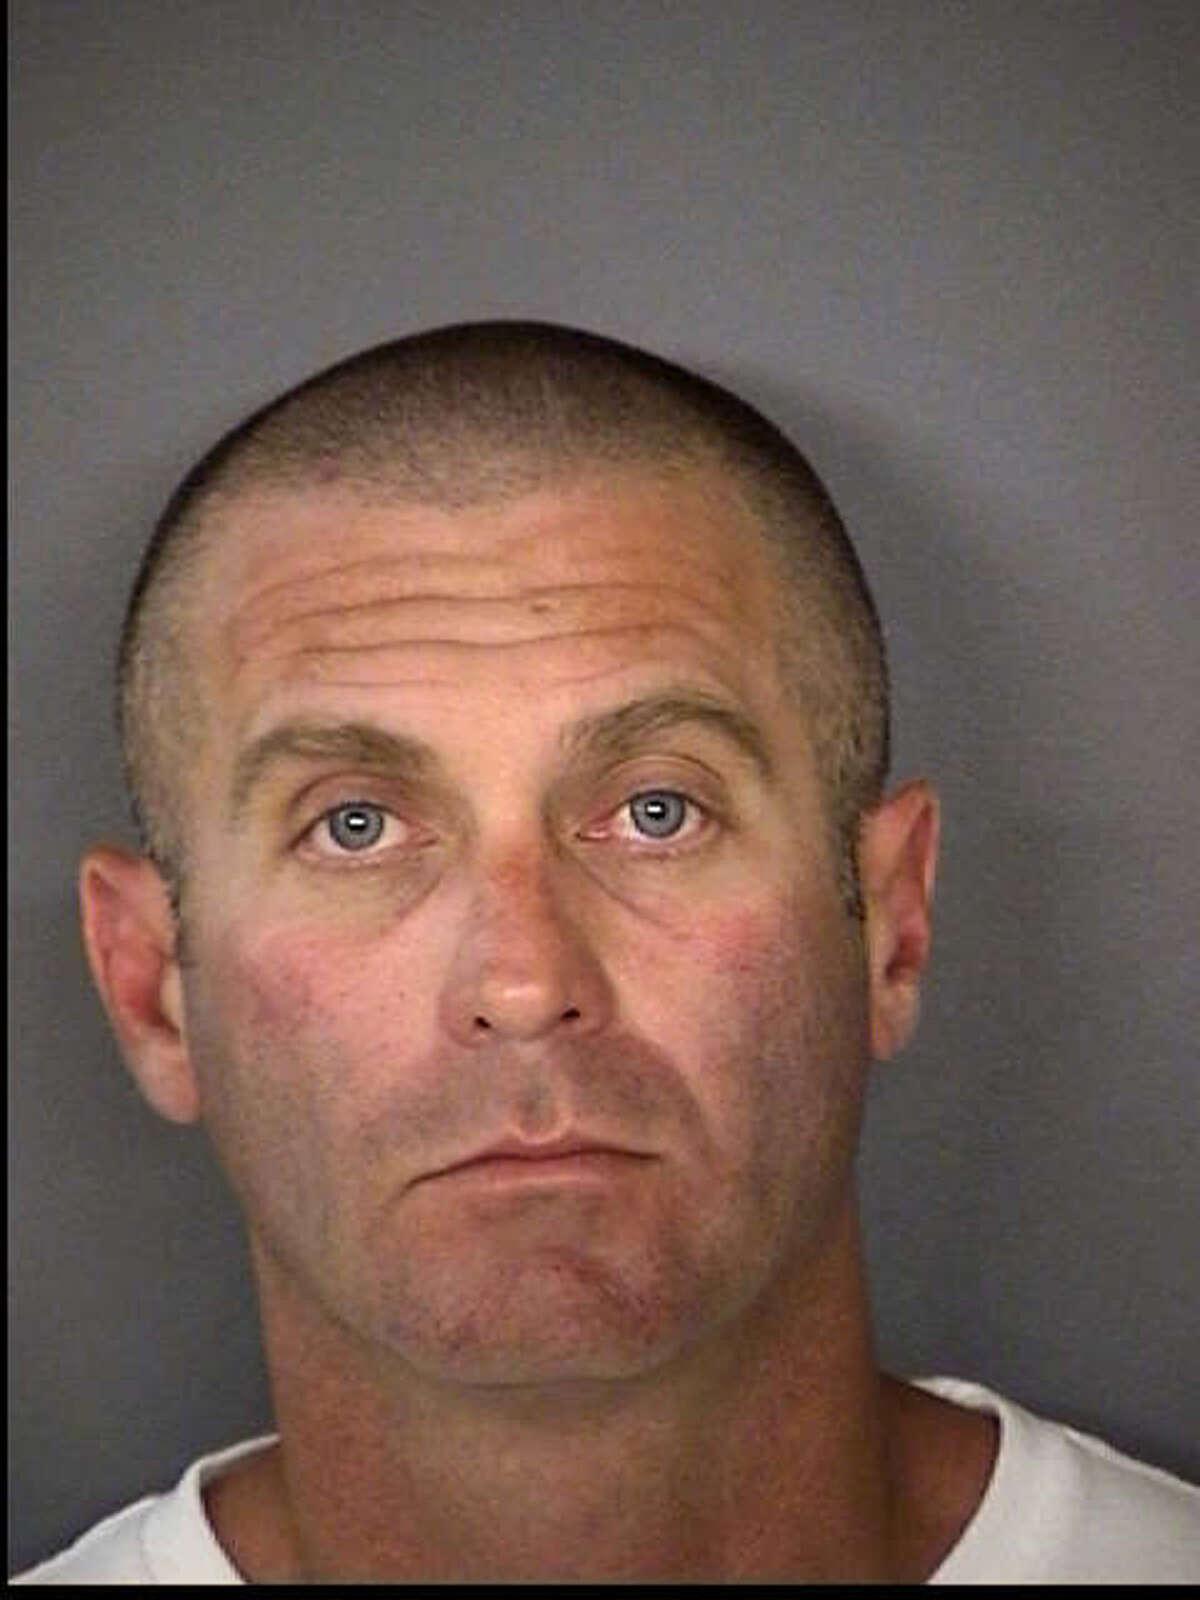 William Joe Rhomer, 43, was convicted Friday of murder for the 2012 drunken-driving crash that killed motorcyclist Gilbert Chavez, 40.